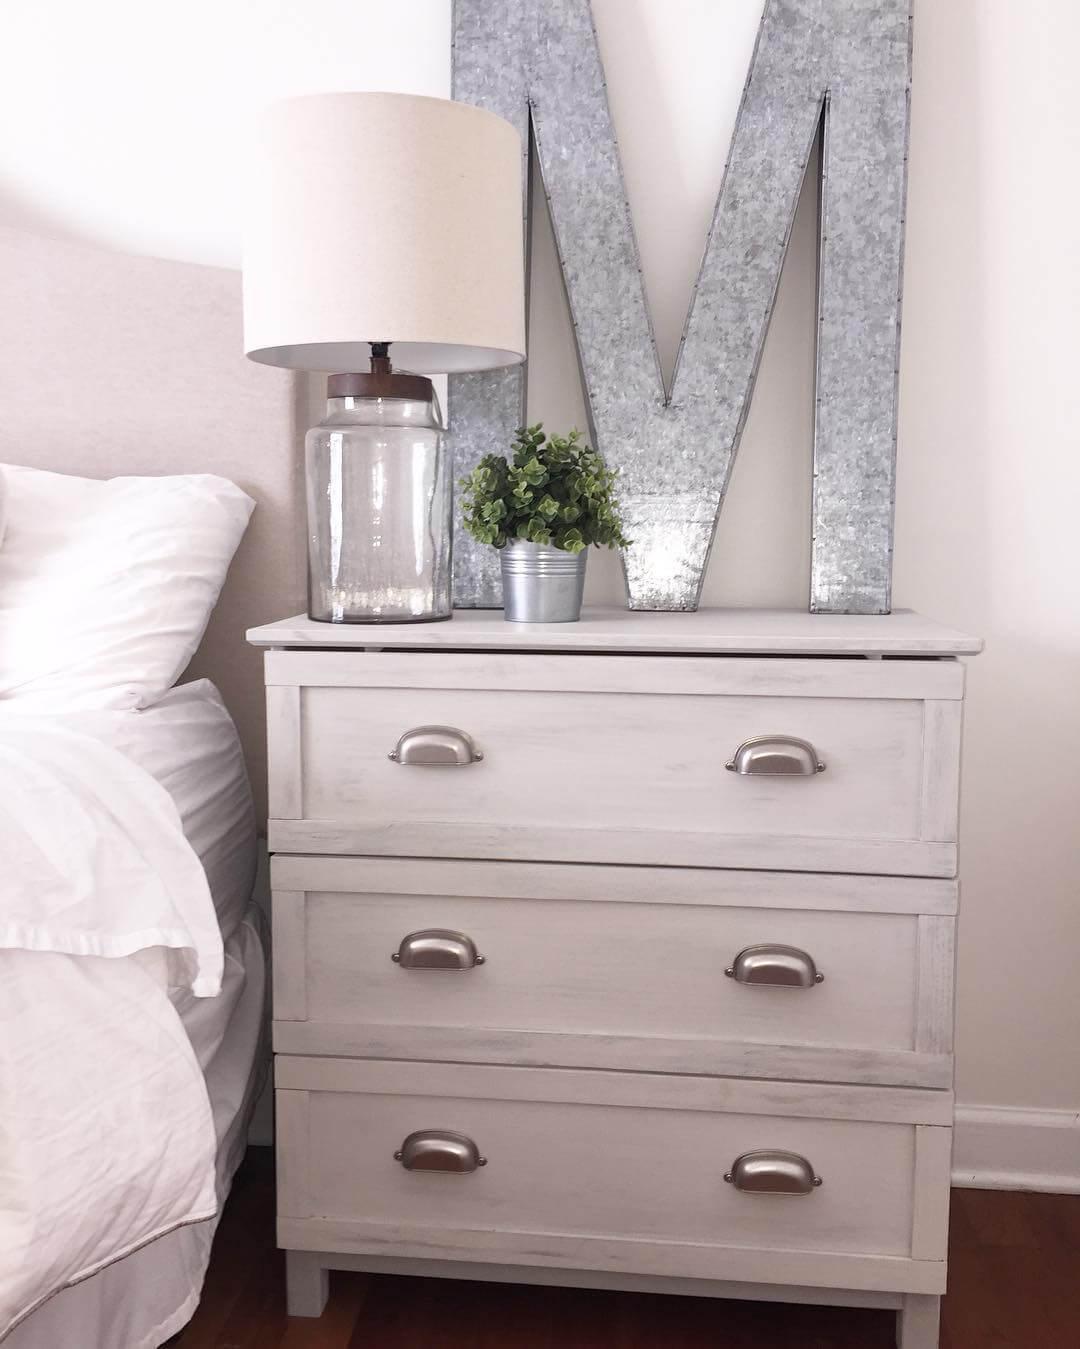 diy nightstand easy